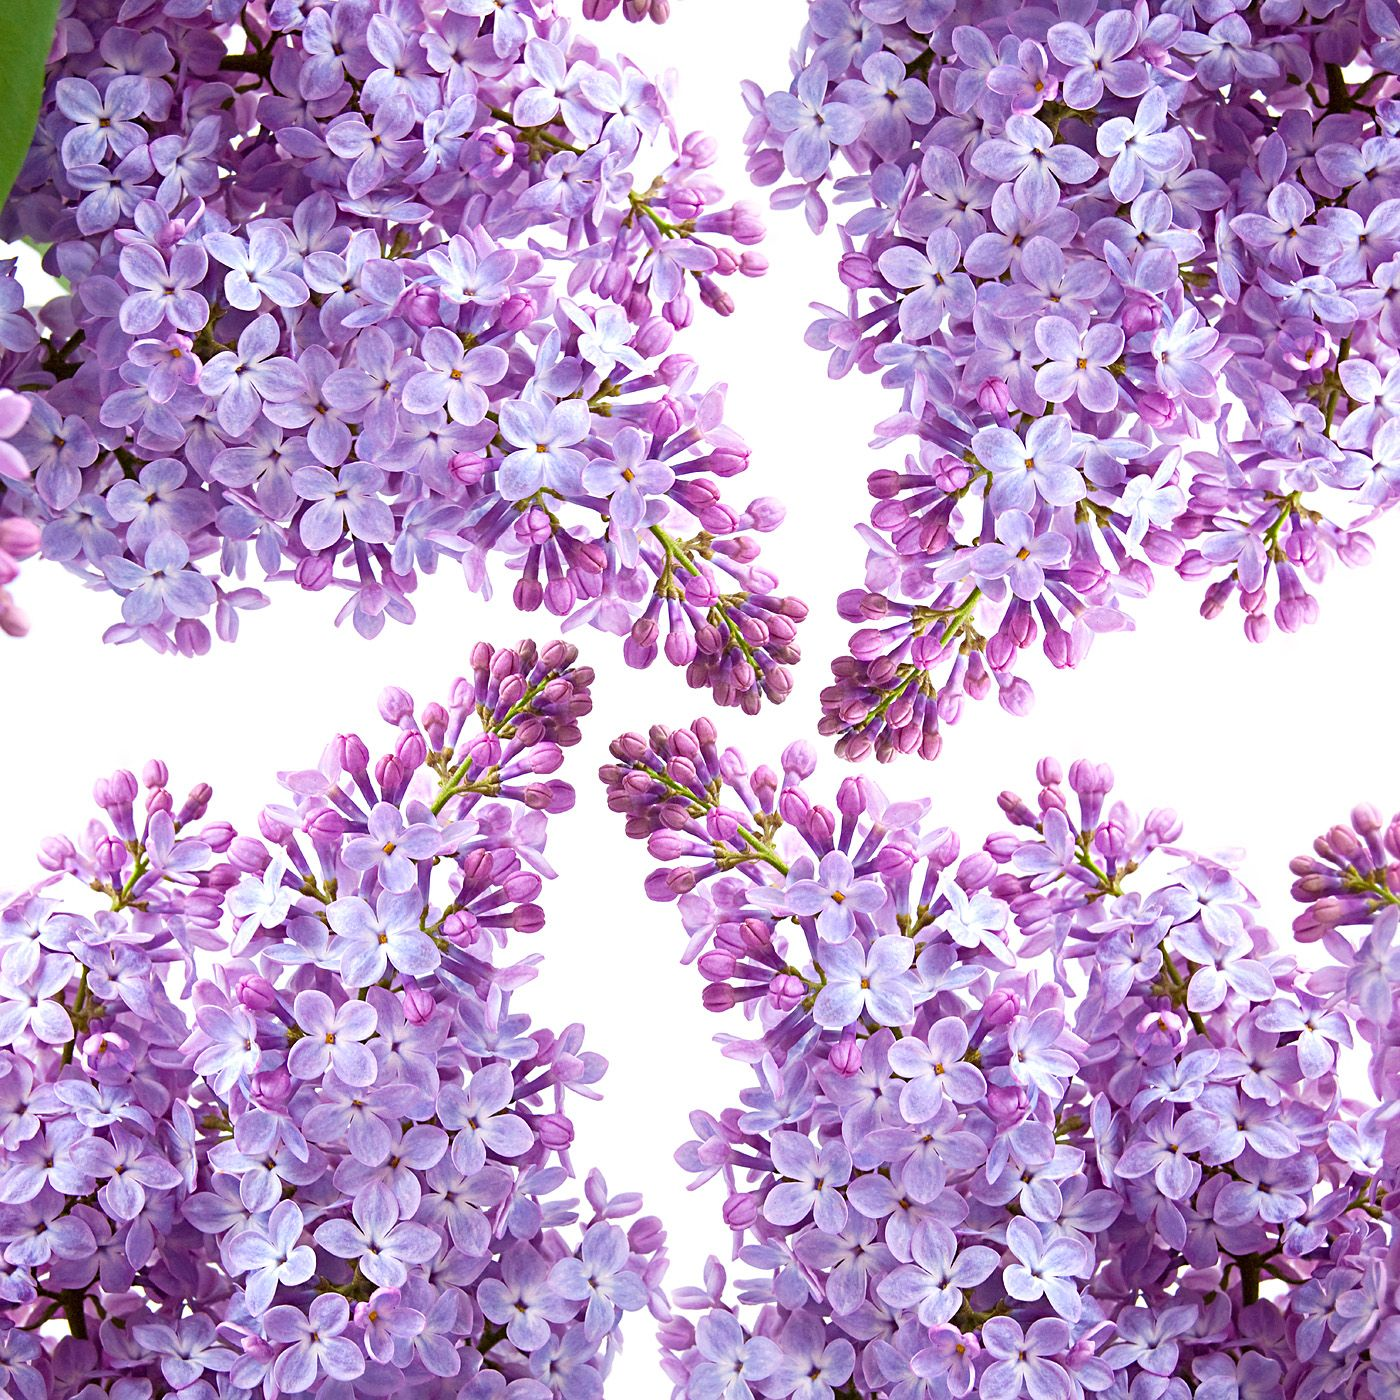 Lilac 46711 Flower wallpaper, Purple flower background